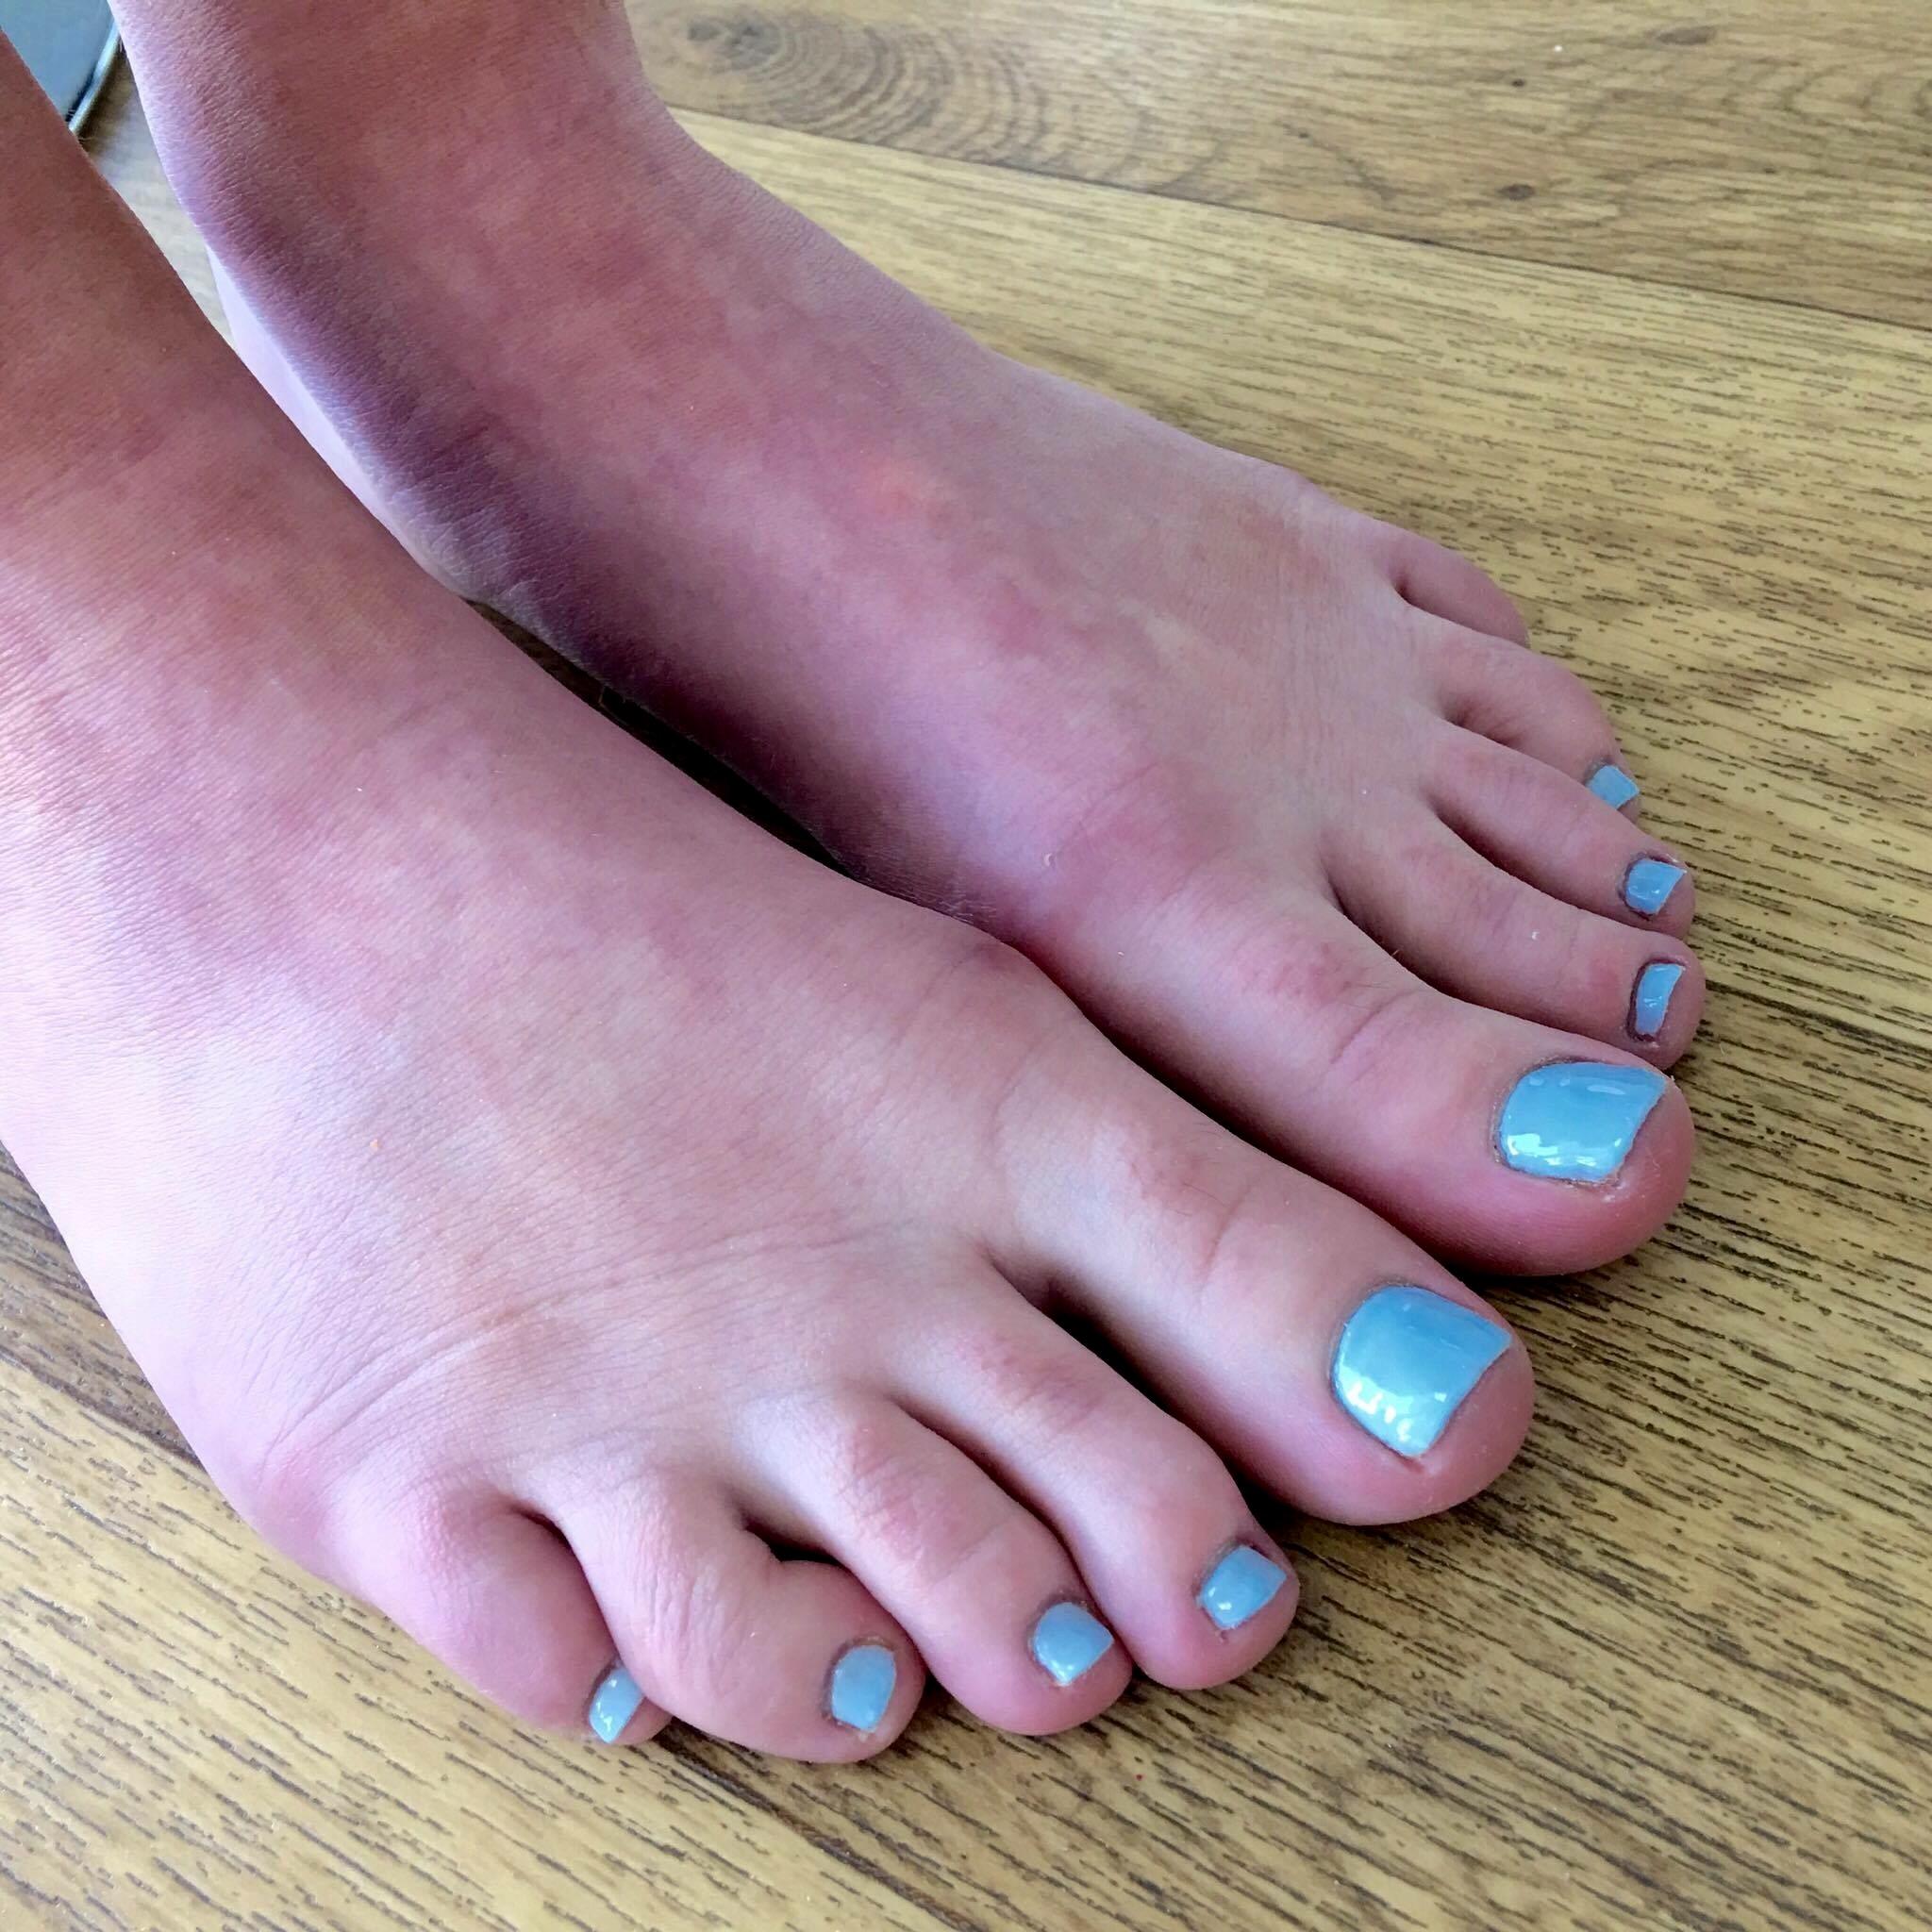 Amys Nails | The Greener Nail Bar Alton, Farnham & Petersfield